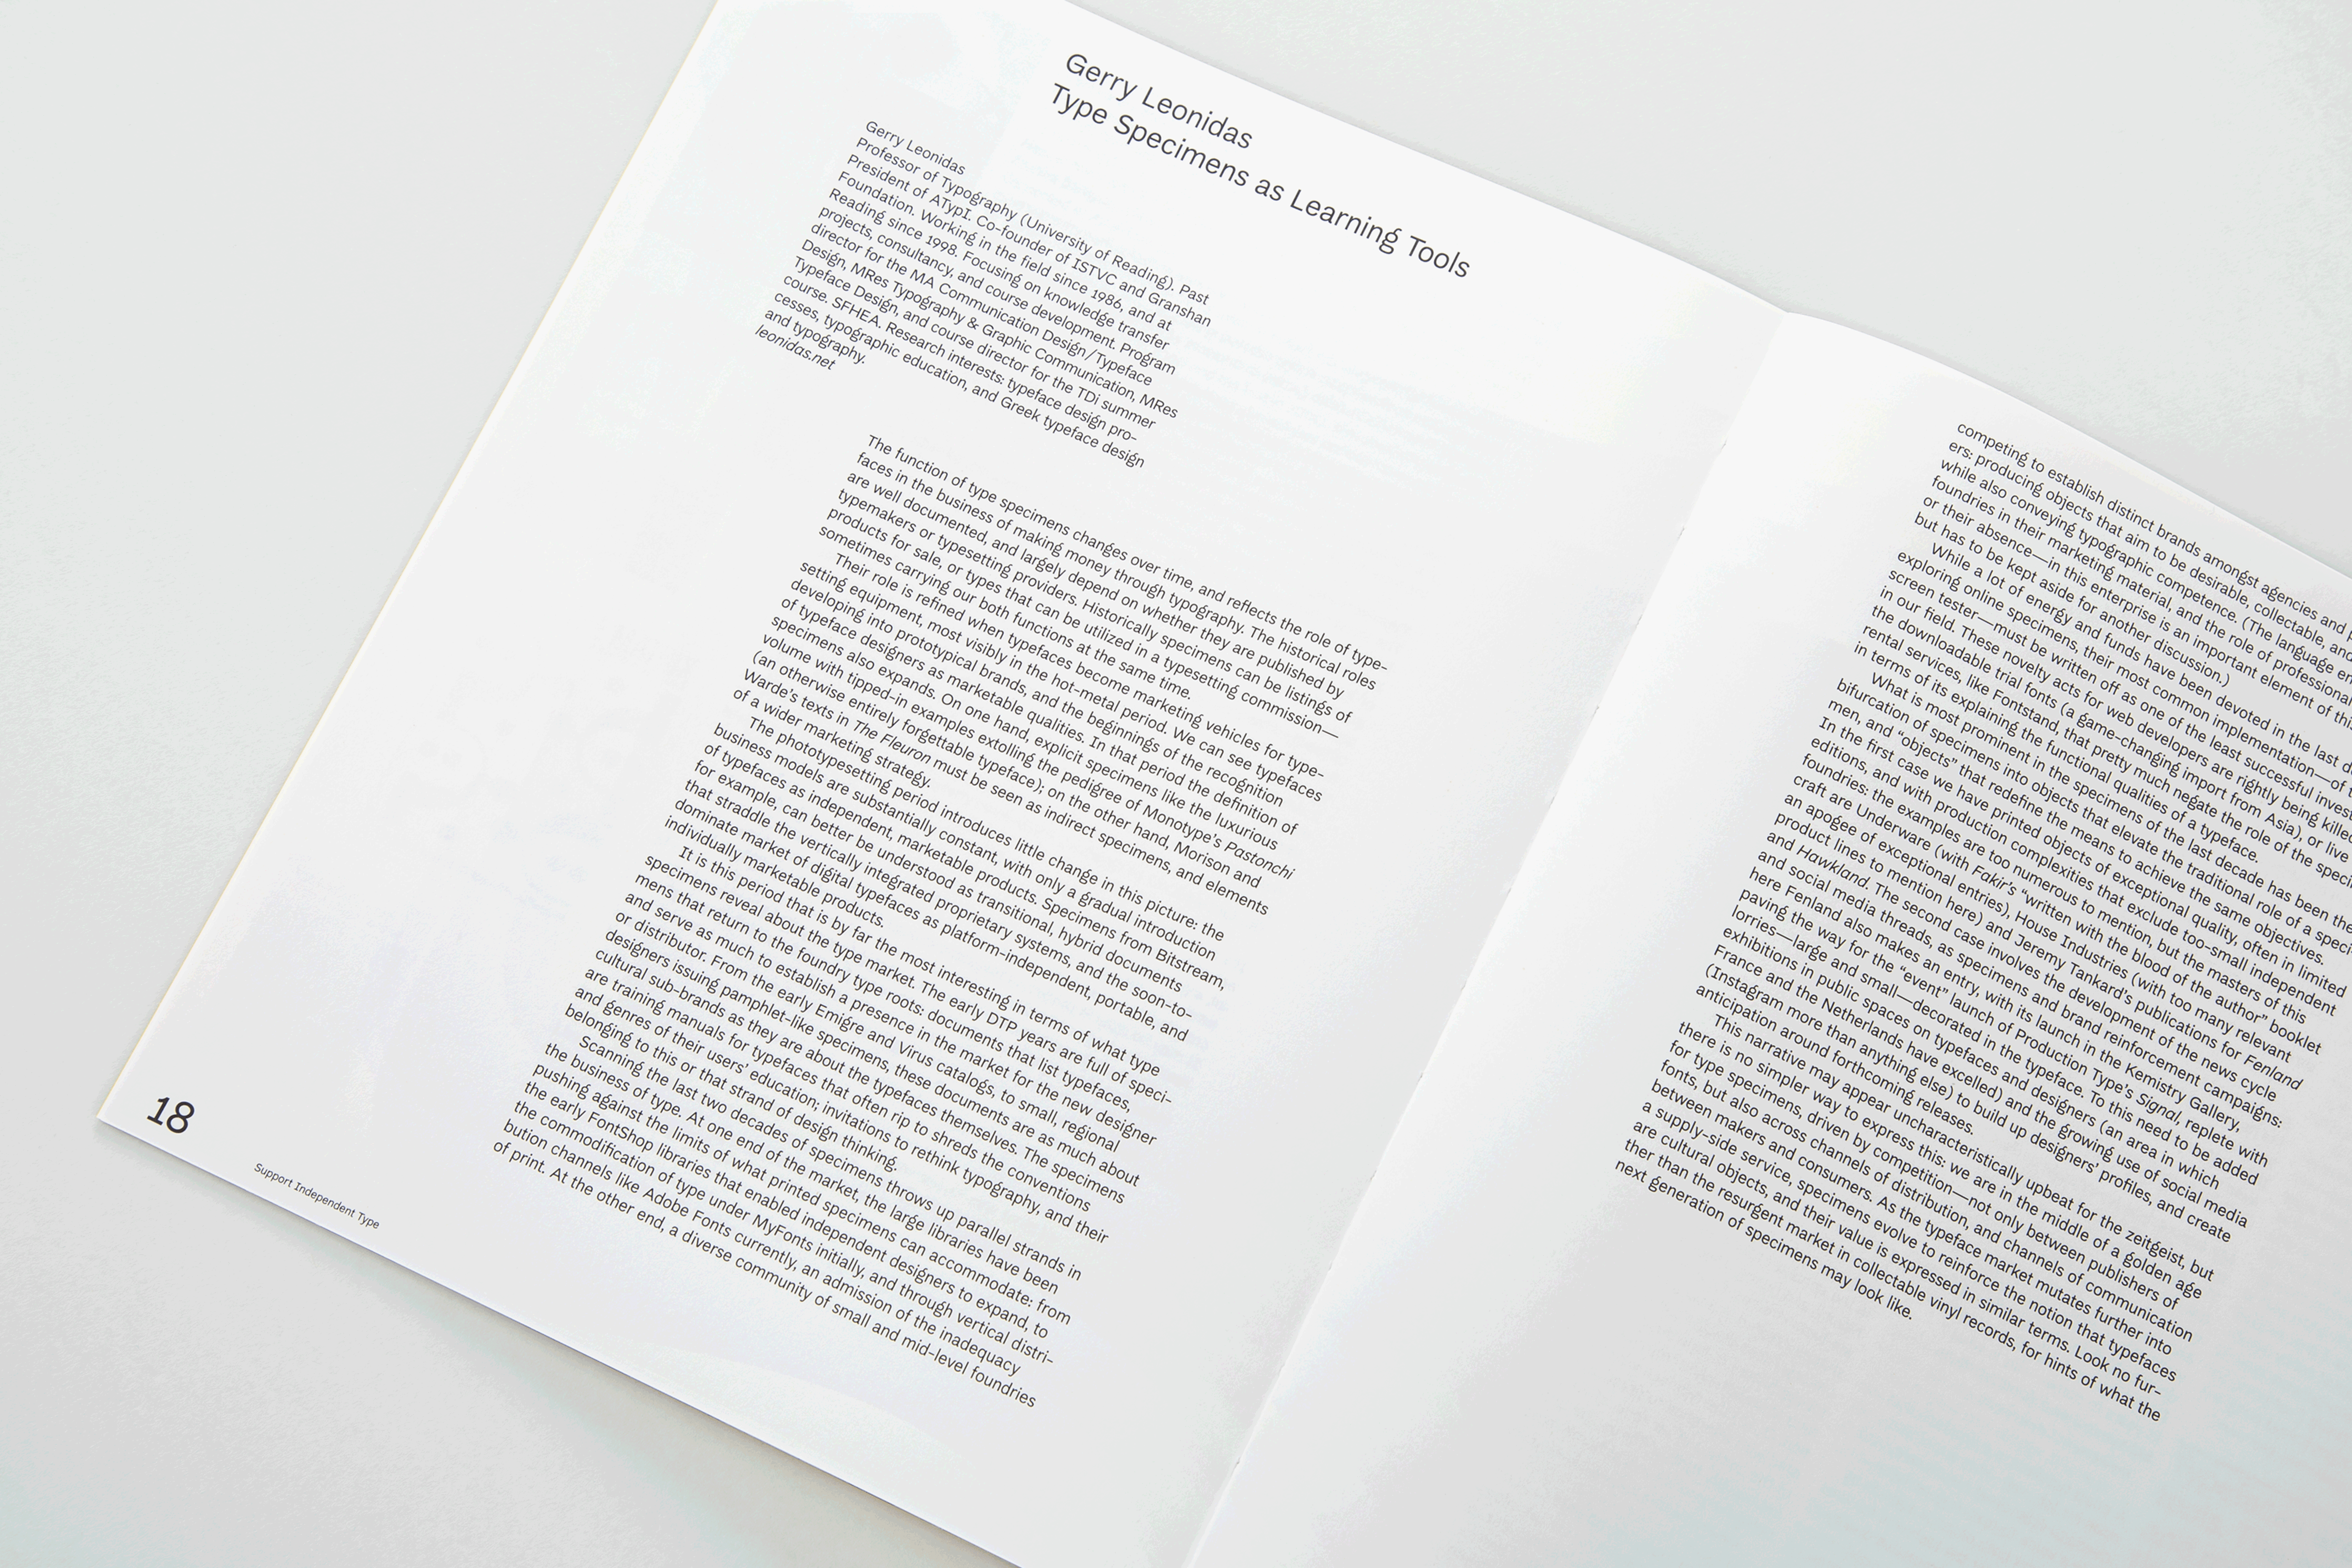 Slanted-Publiaktionen-Slanted-Publishers-Support-Independent-Type_08